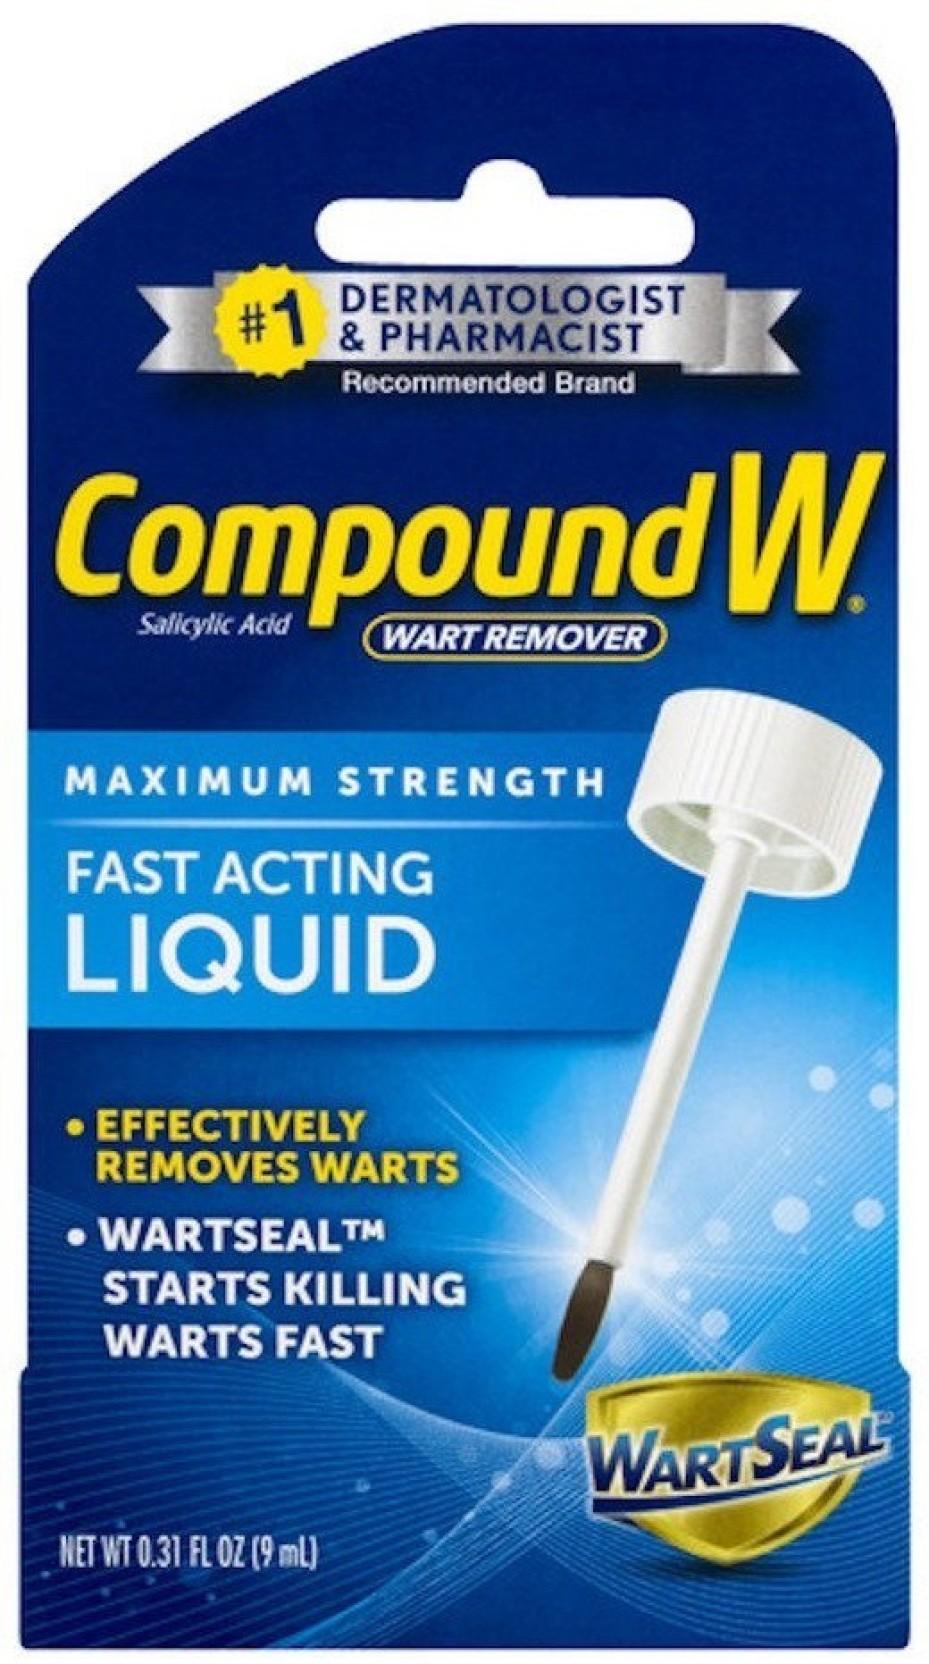 Compound W Wart Remover Liquid-0 31 oz  Price in India - Buy